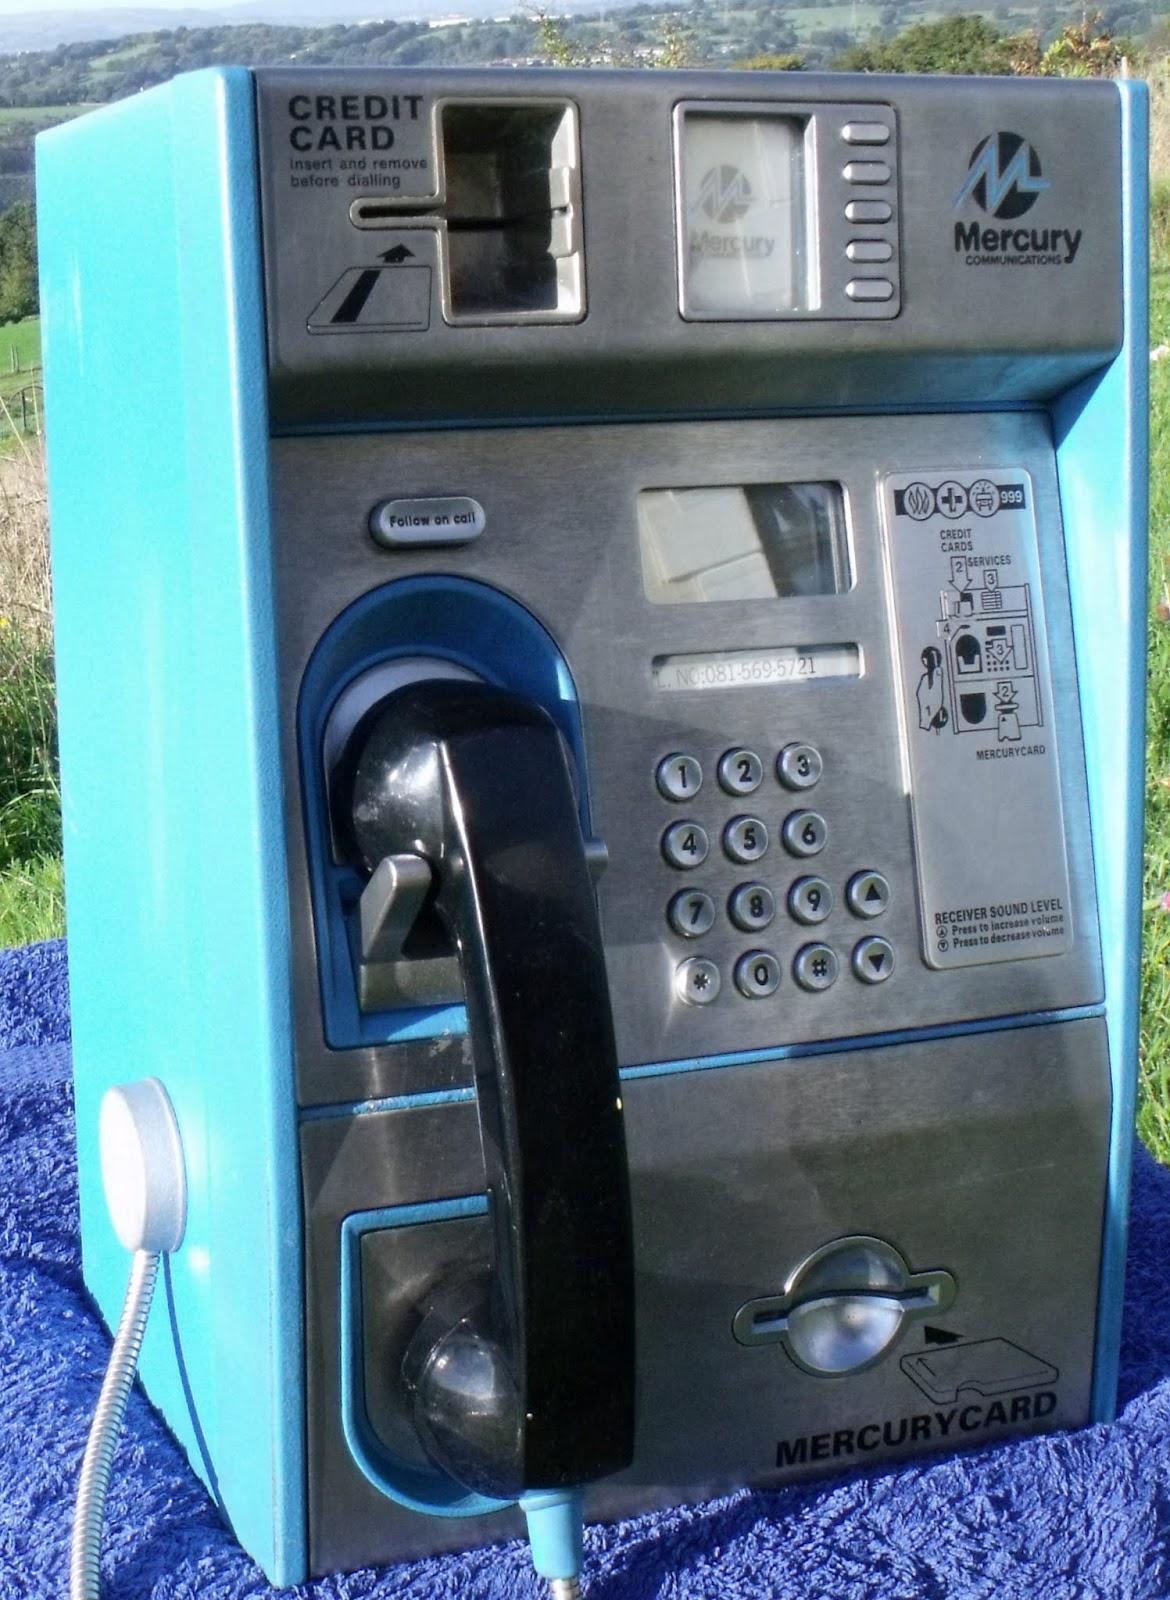 mercury card phone - Payphone Calling Cards